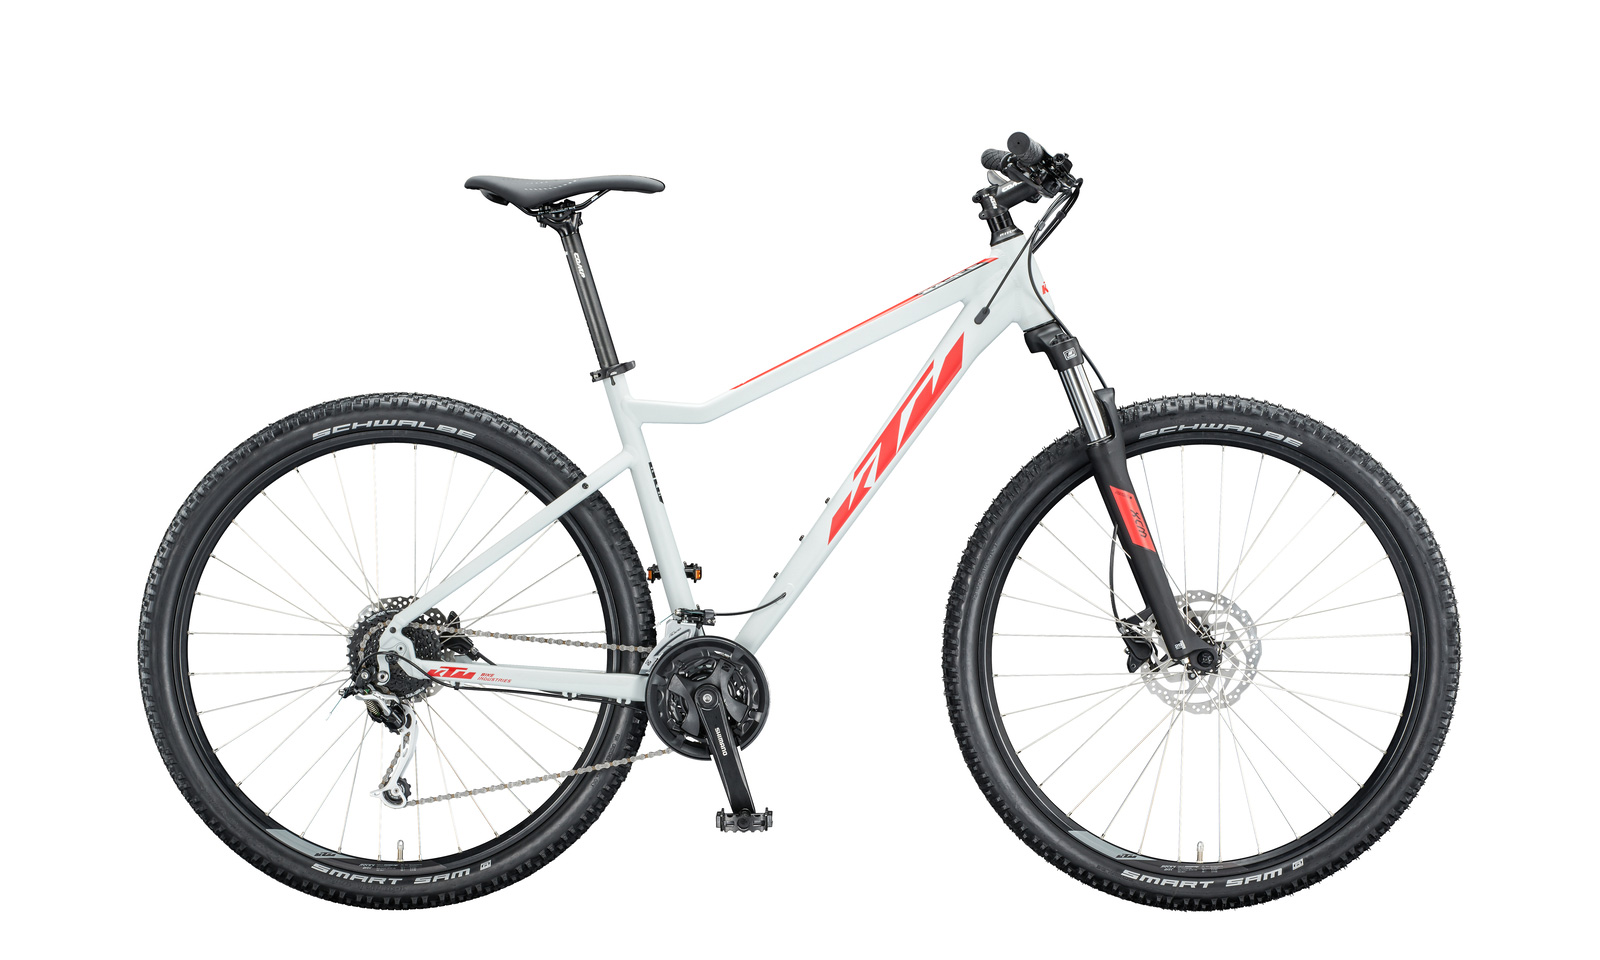 Biciclete KTM MTB Hardtail ULTRA FUN 29.27 3x9 Shimano Deore XT